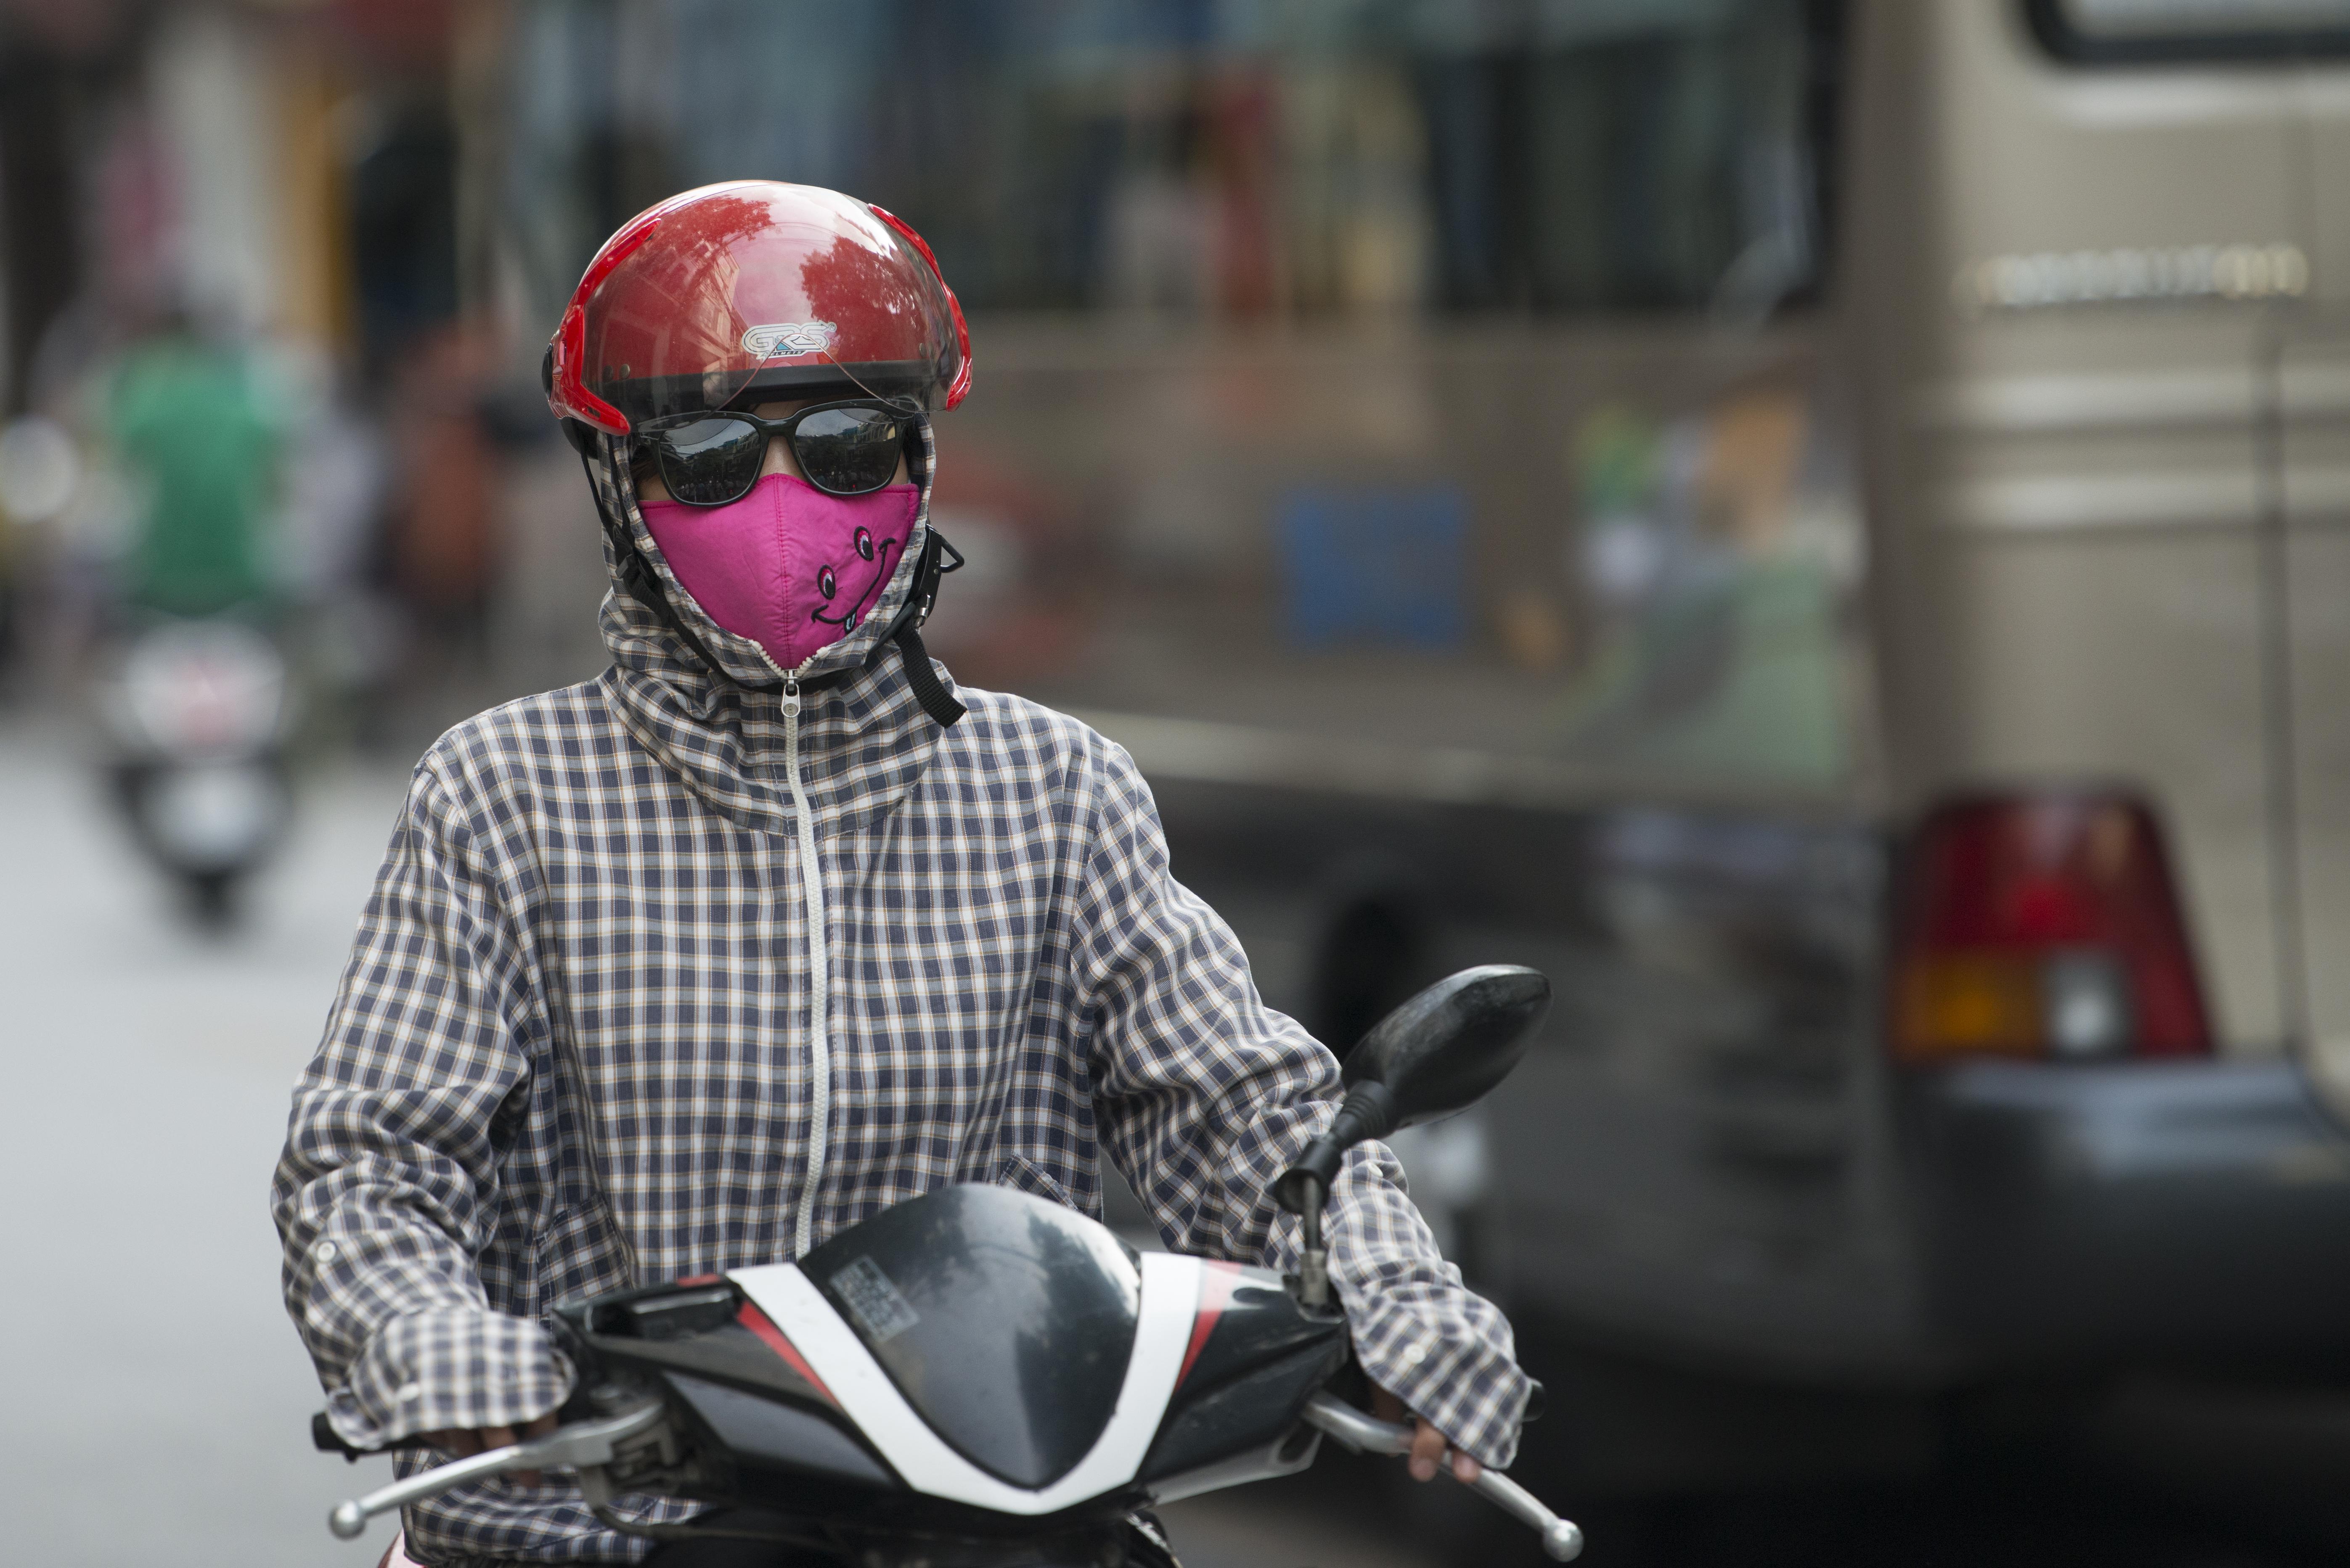 Woman on Scooter_Hanoi